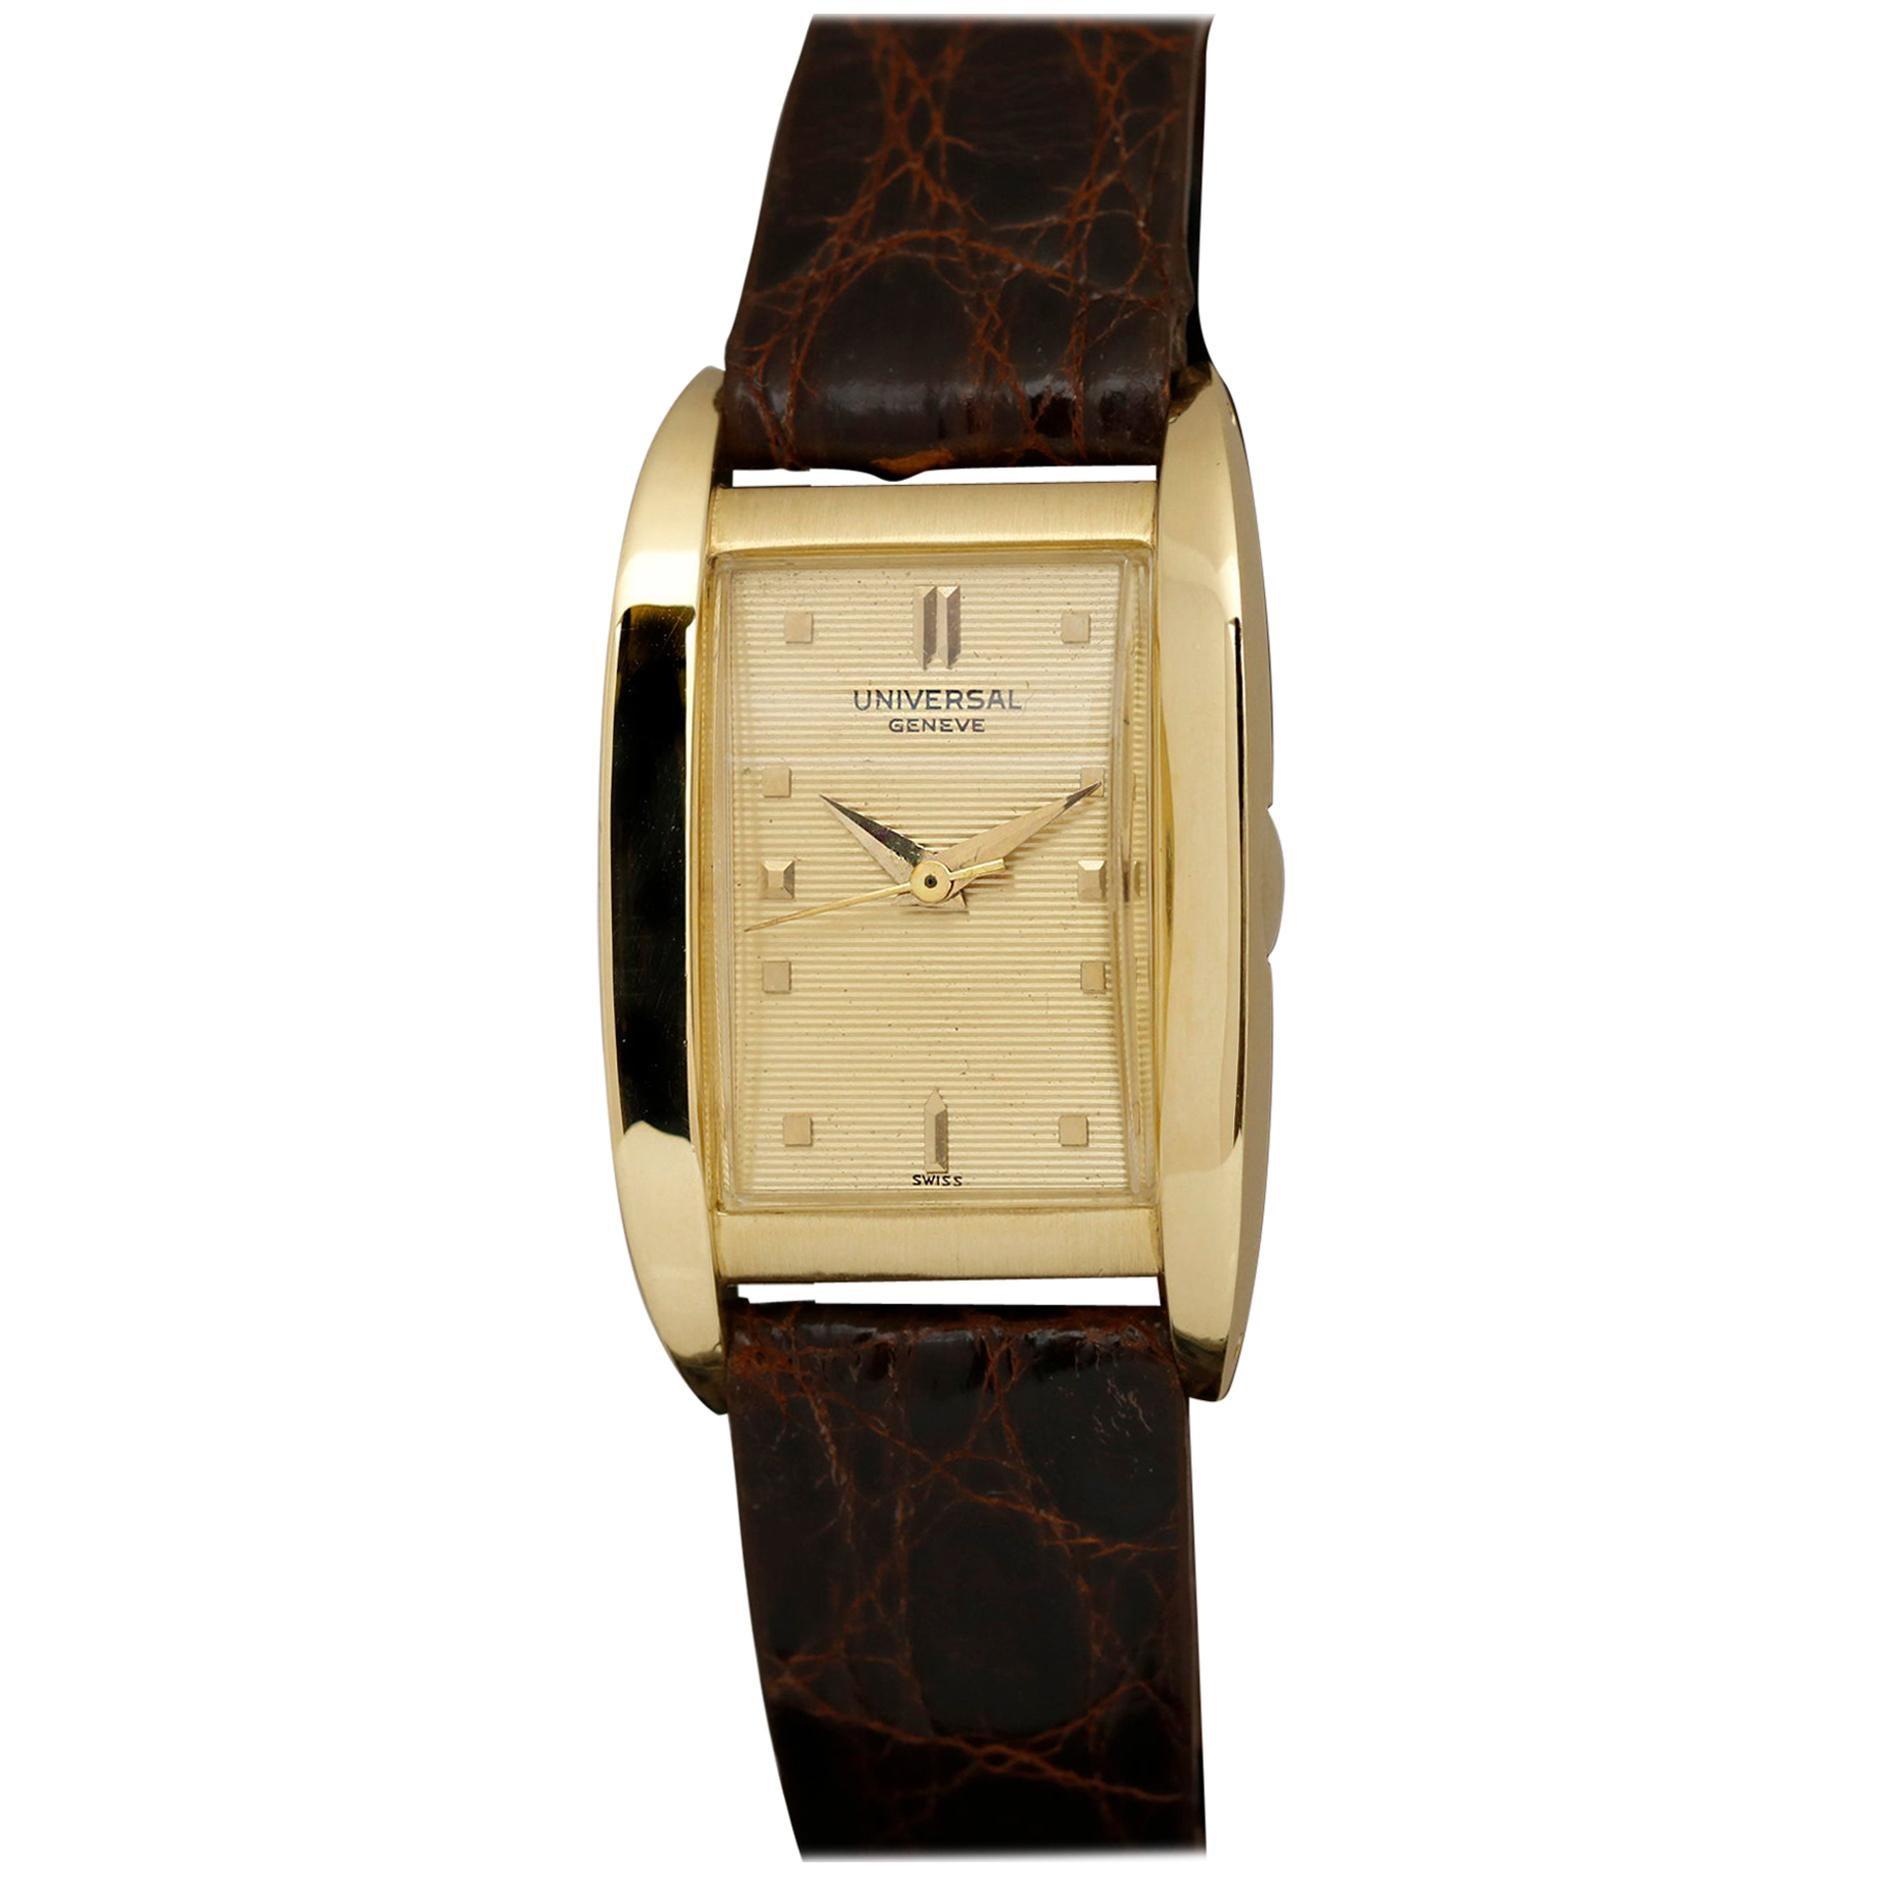 Rare Universal Genève Reference 18915 Yellow Gold Wristwatch, circa 1856